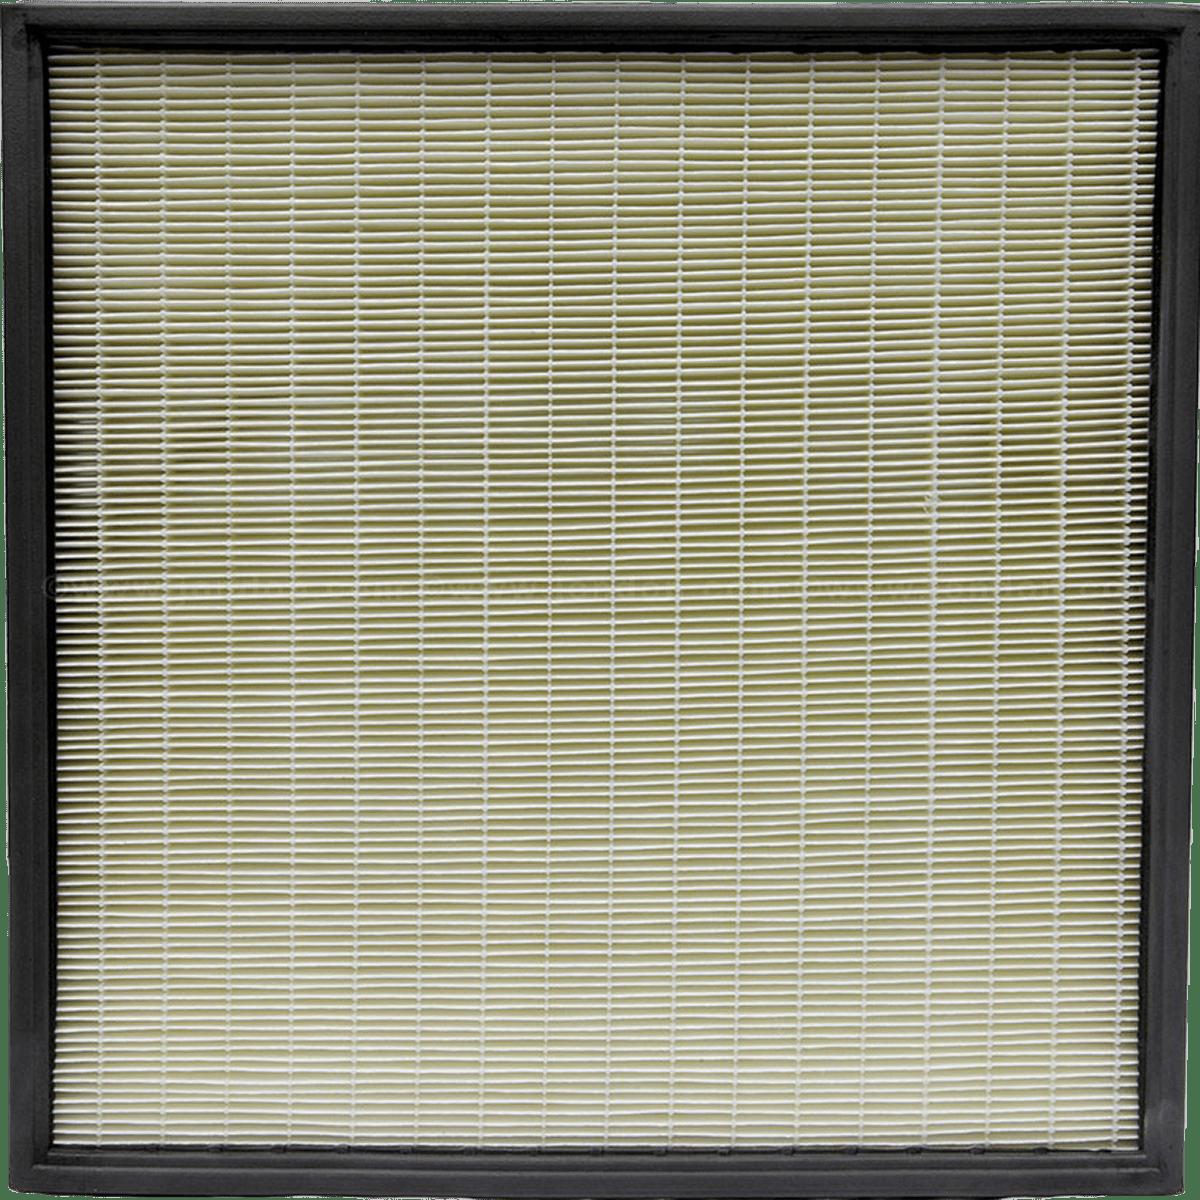 HEPA Air Filter 2.5x18x18 Inch (4031864) ph5612